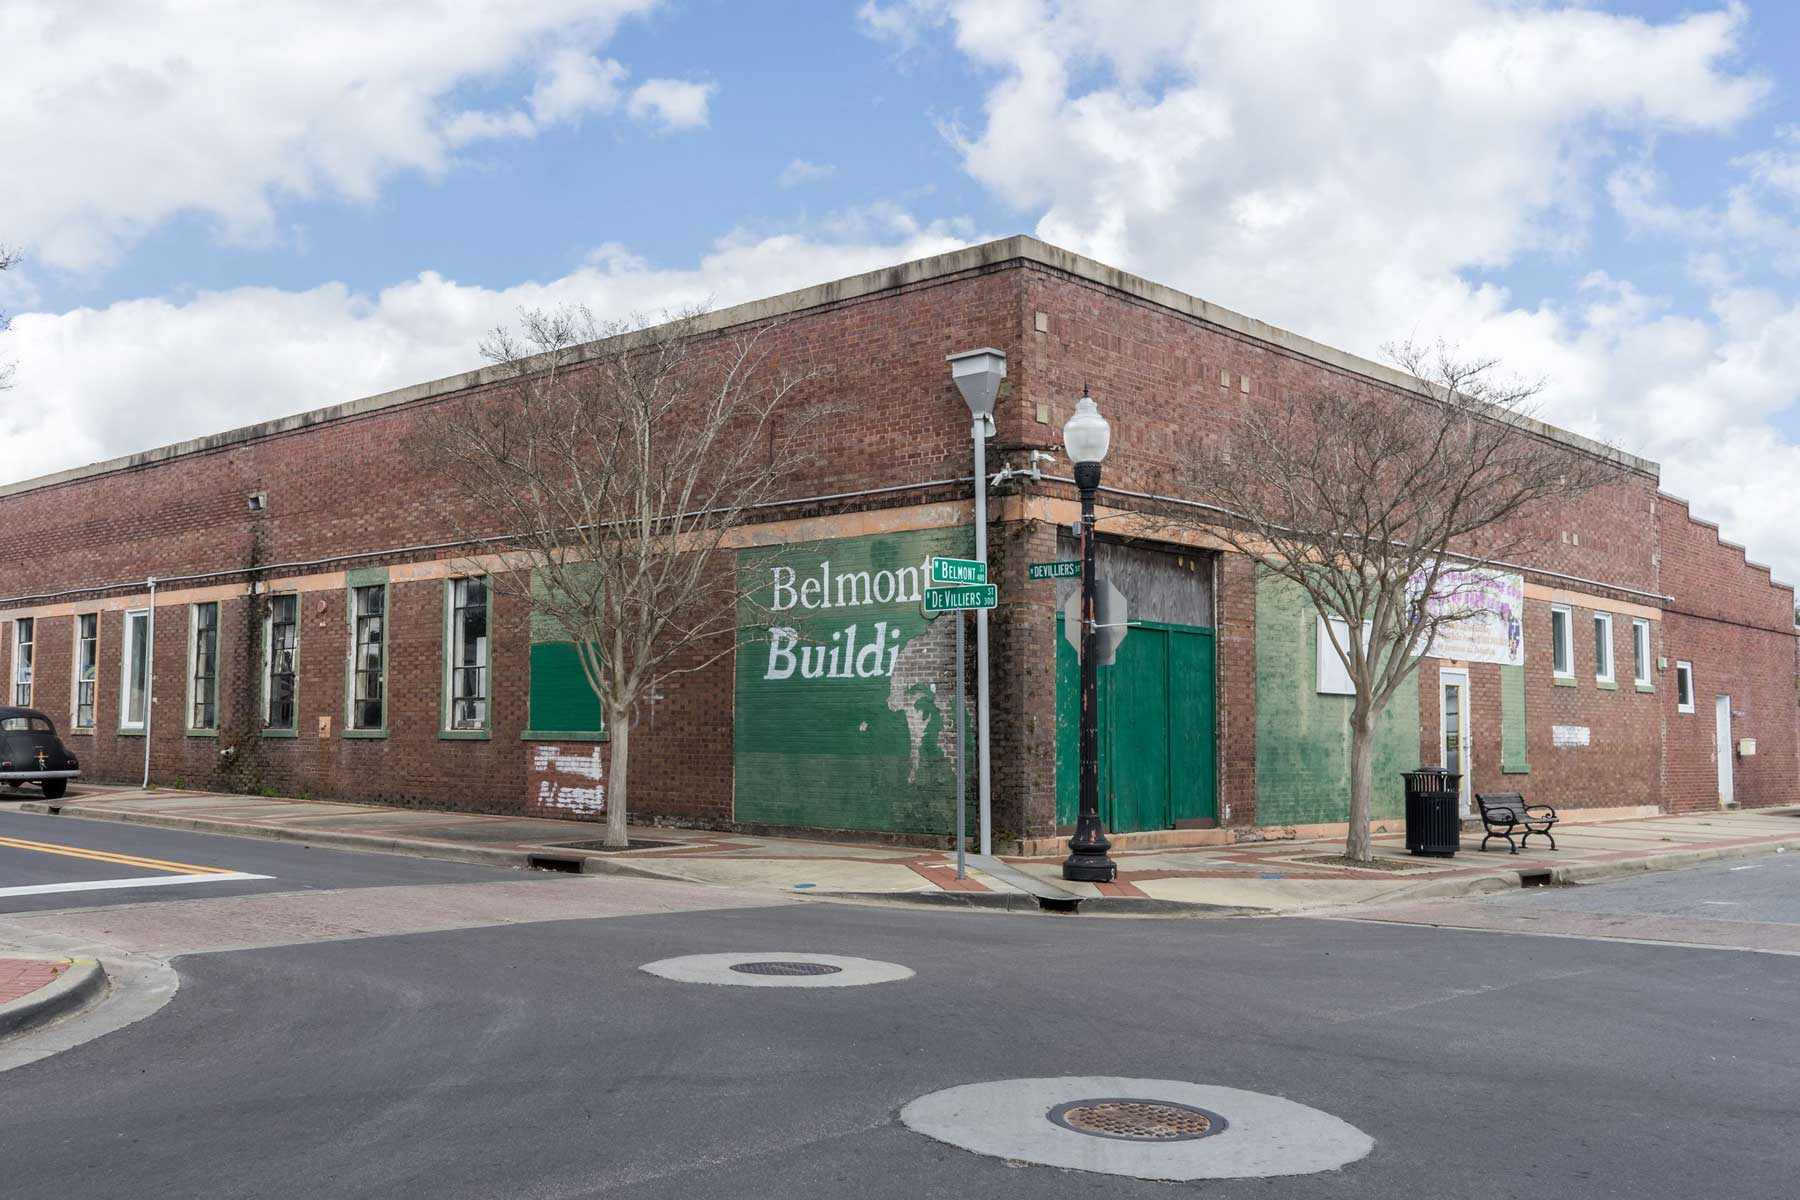 #7 - Smith's Bakery432 West Belmont StreetBuilt 1918